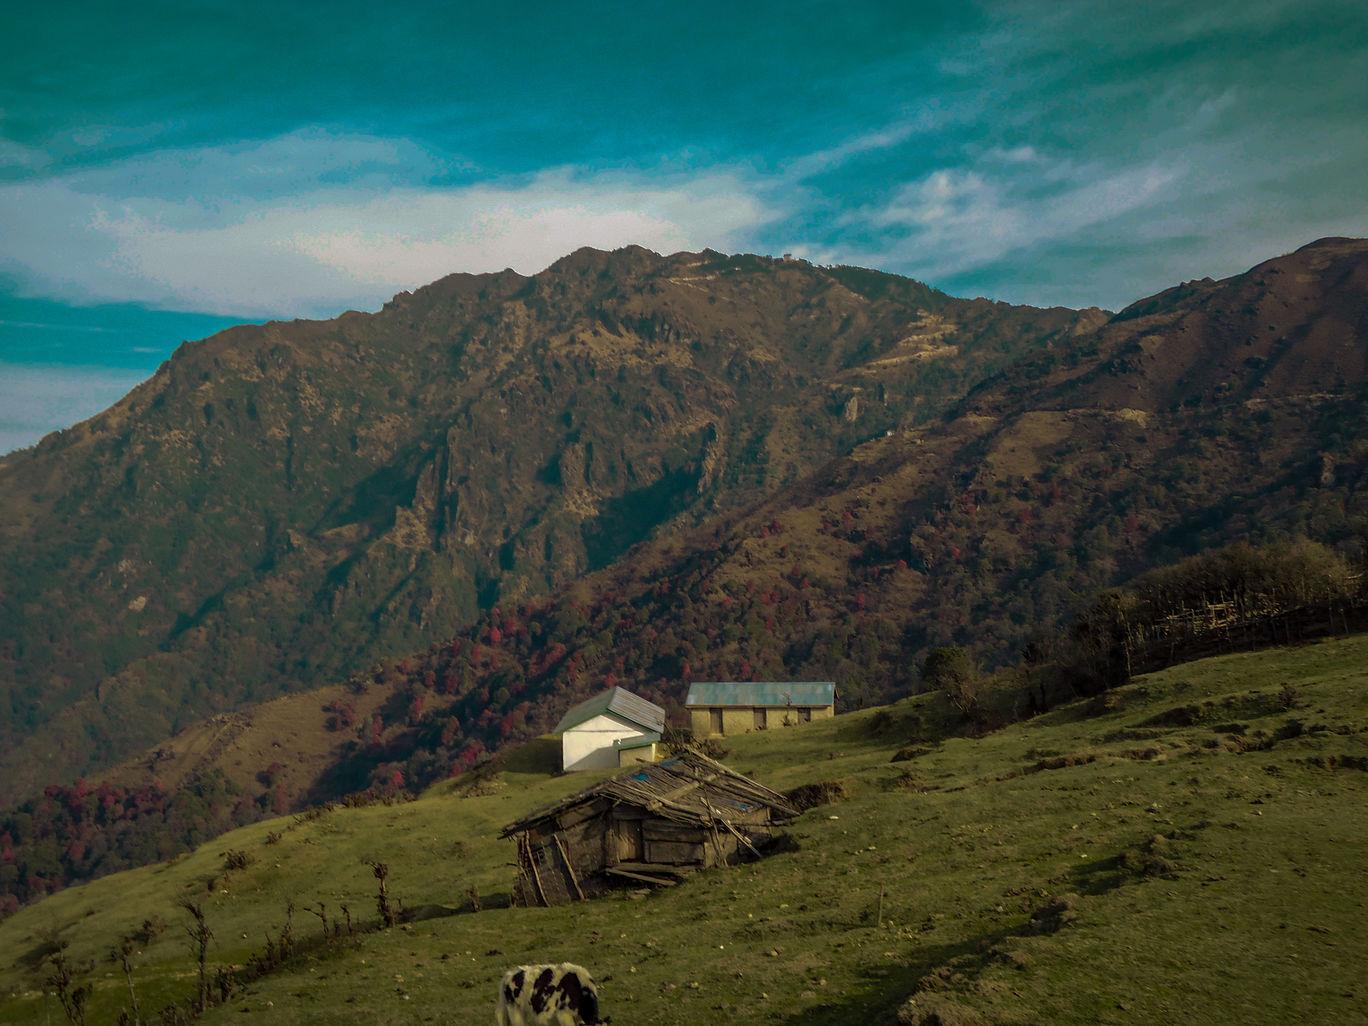 Photo of Sandakphu By Satyam Sundram